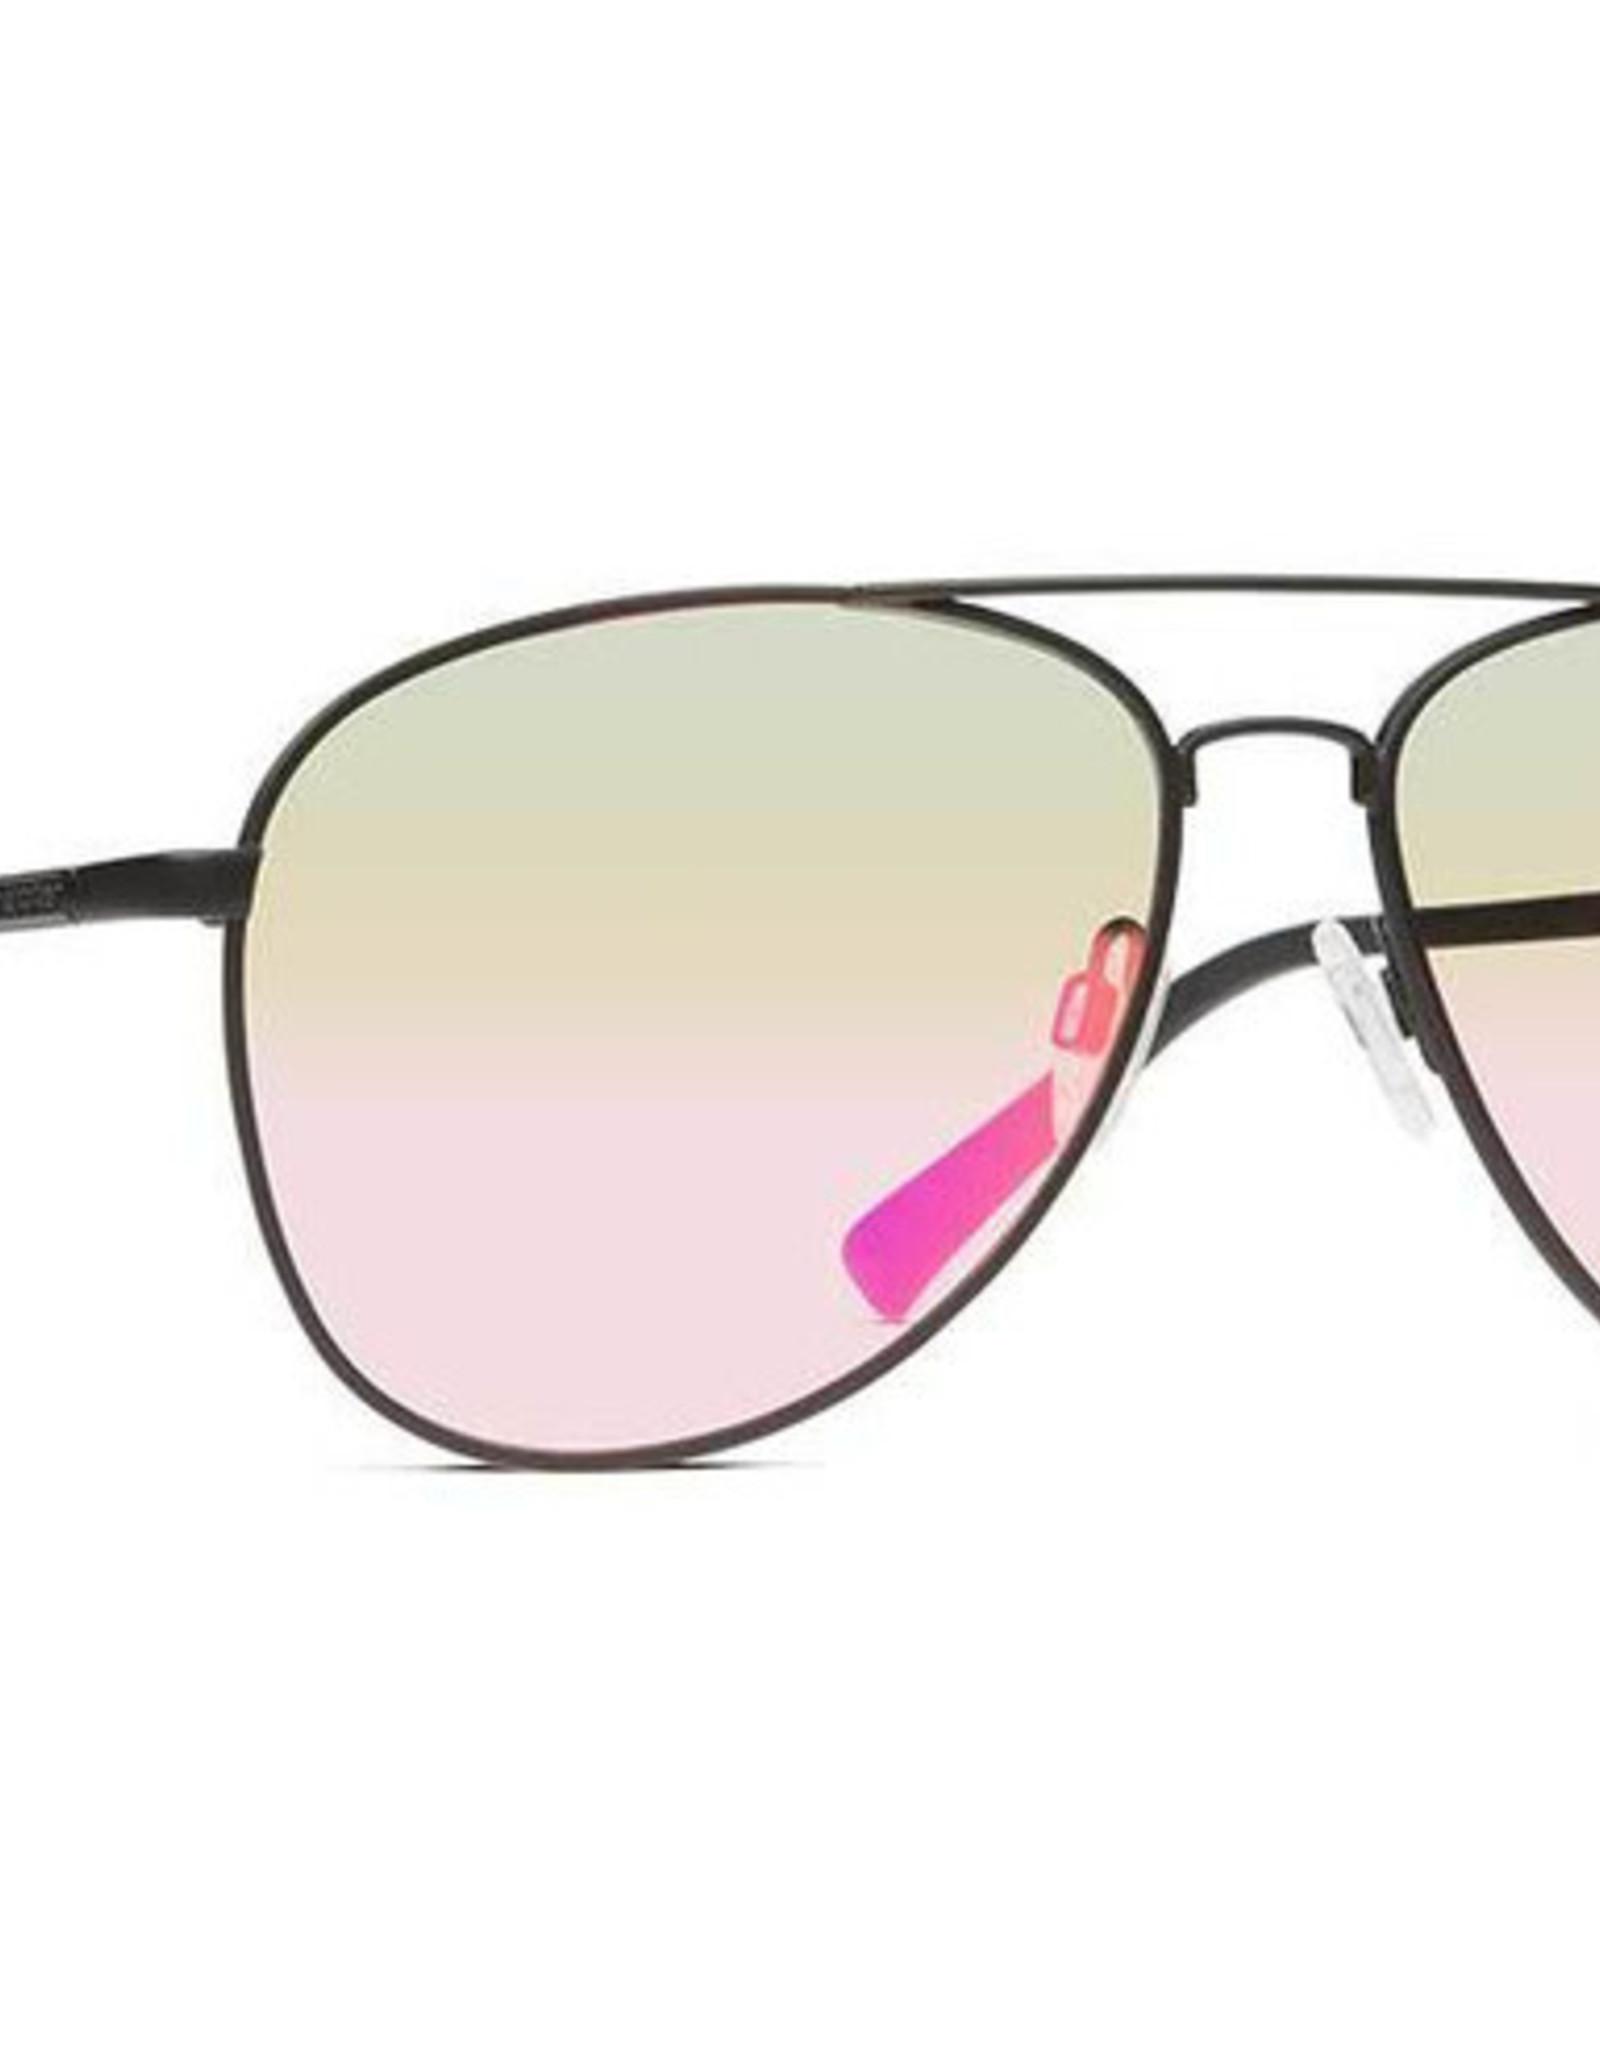 Von Zipper VZ - FARVA - Black Satin w/ Pink Chrome